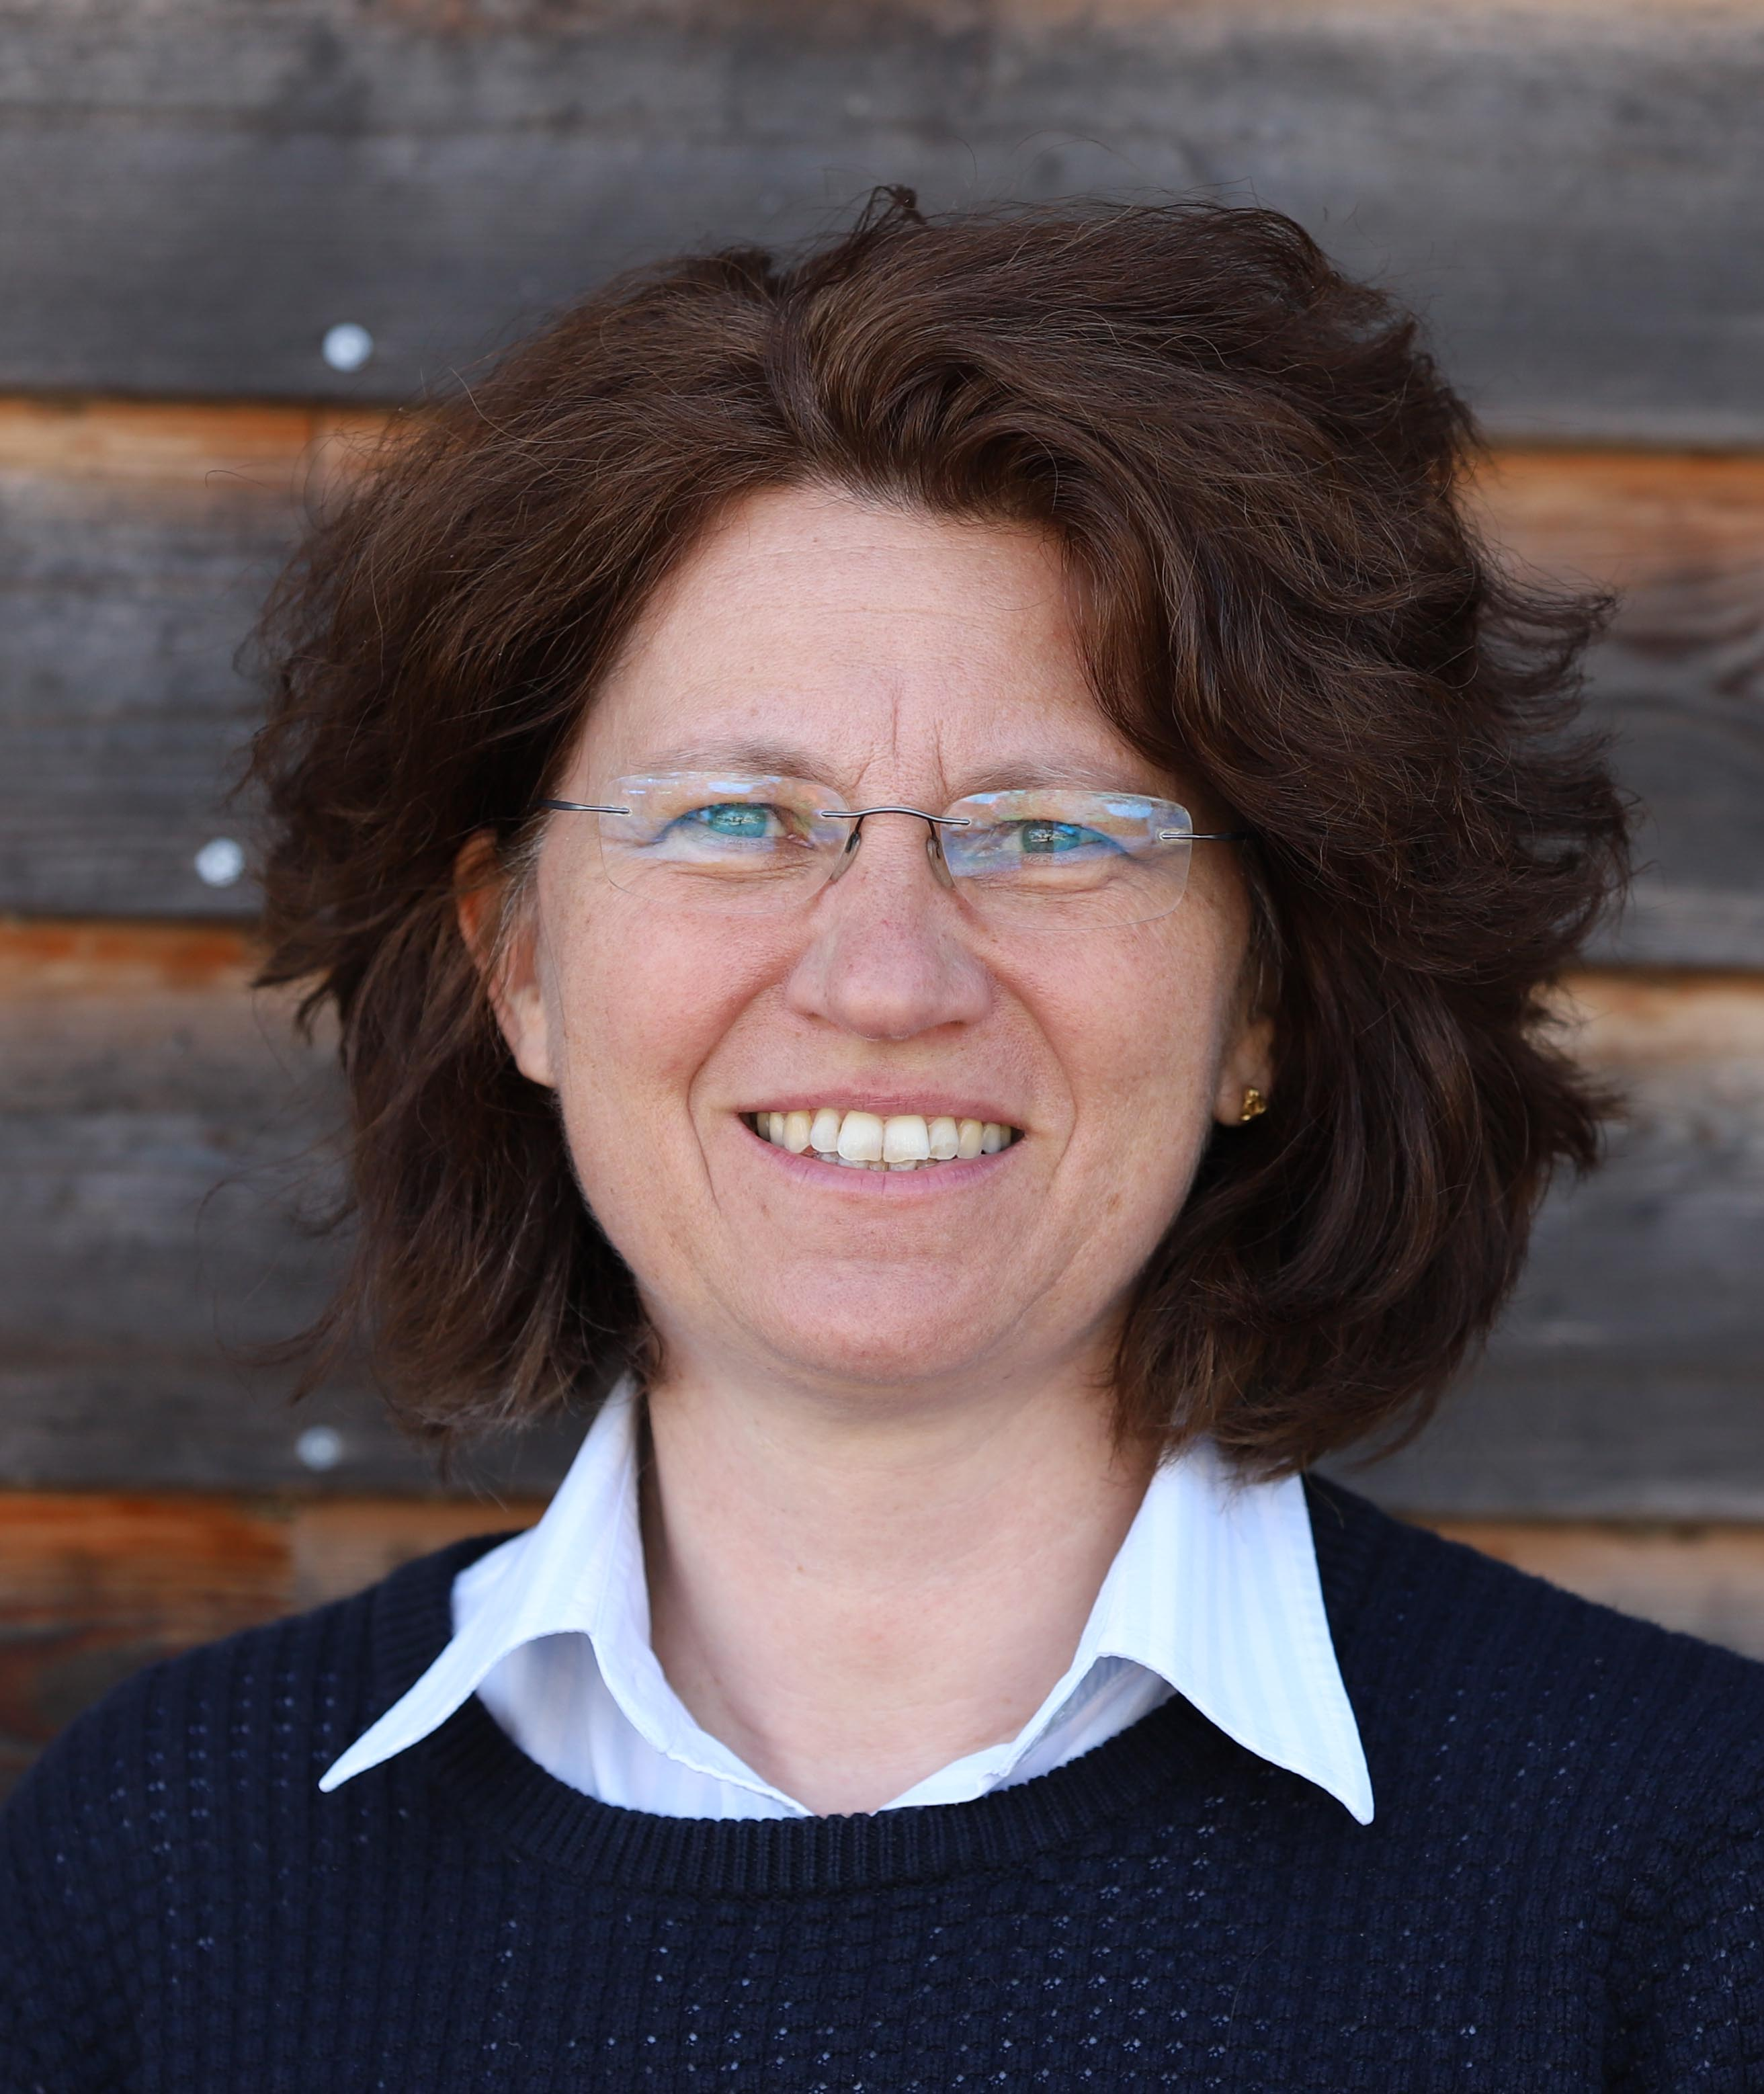 Claudia Haßmann